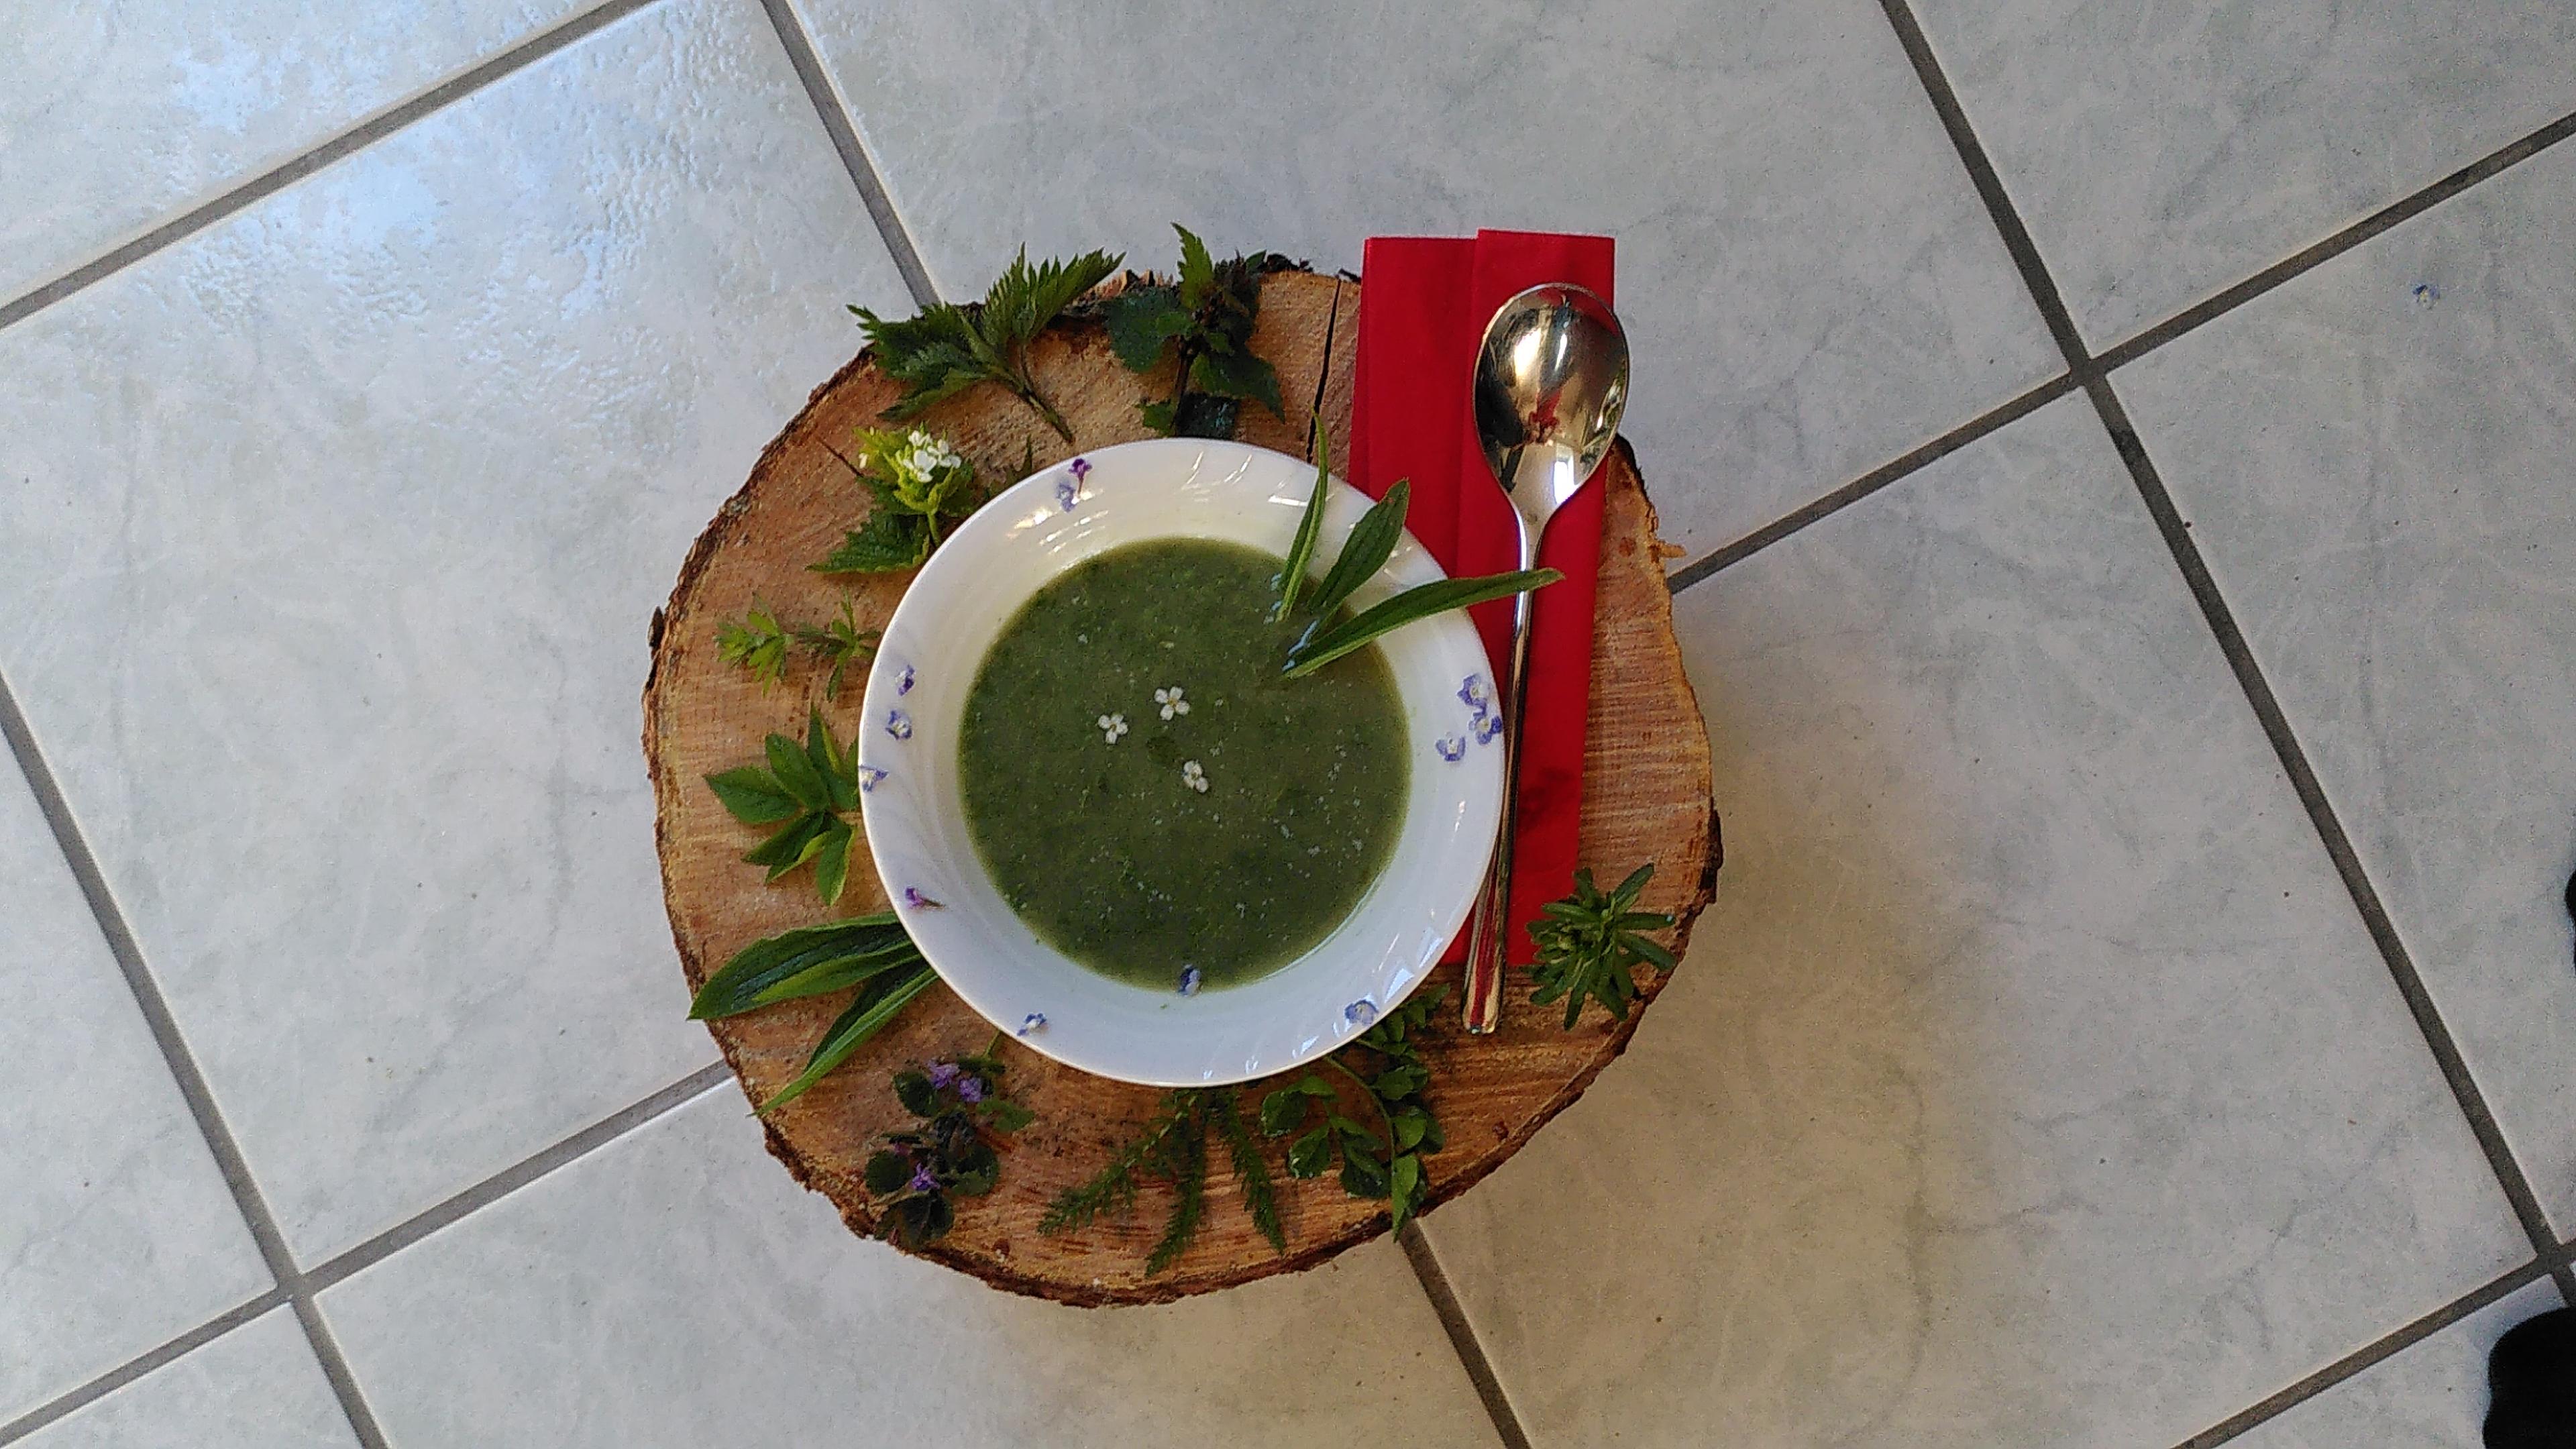 Die grüne Neune Suppe